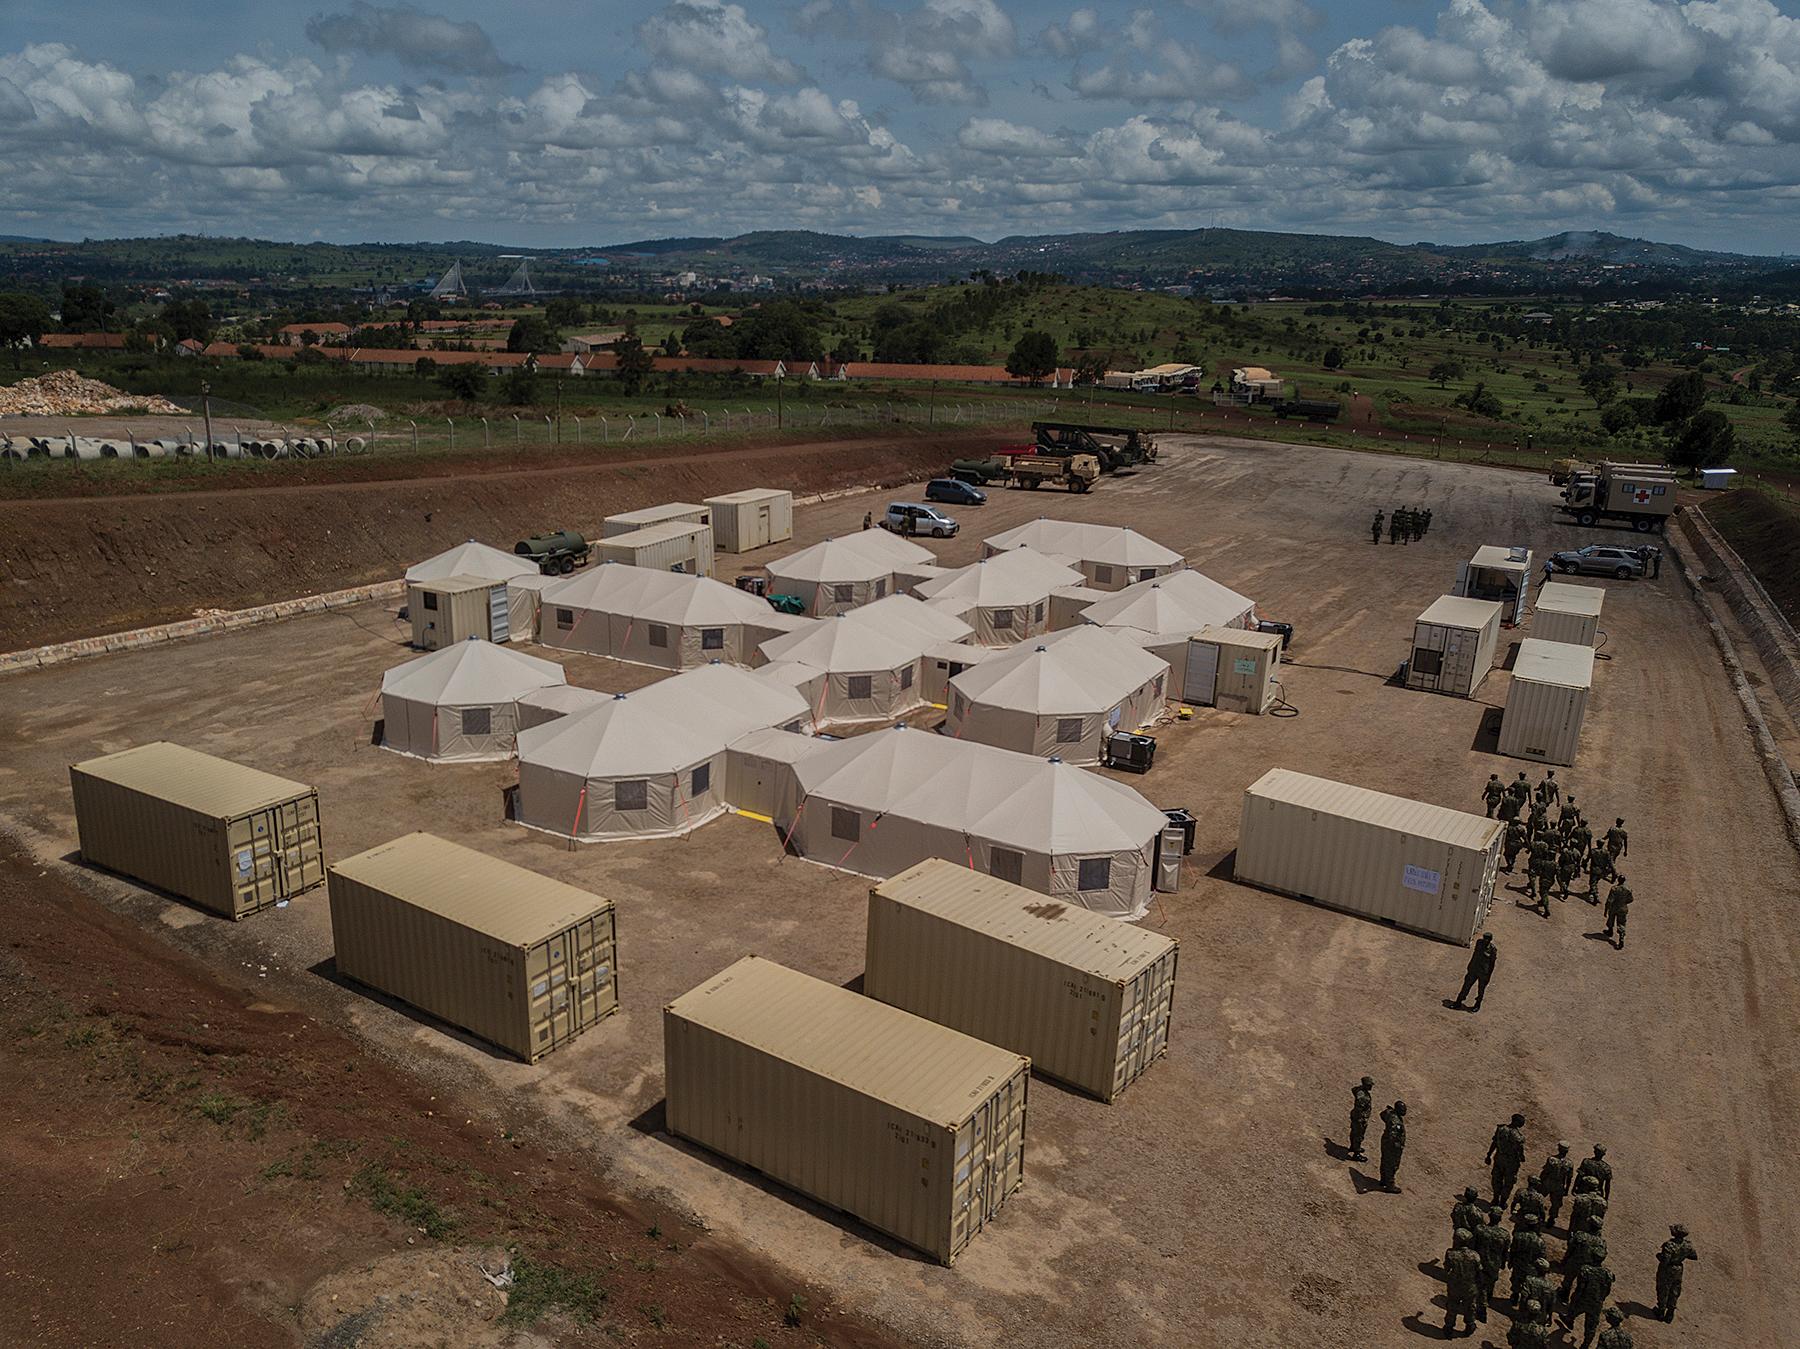 Uganda_FieldHospital.jpg